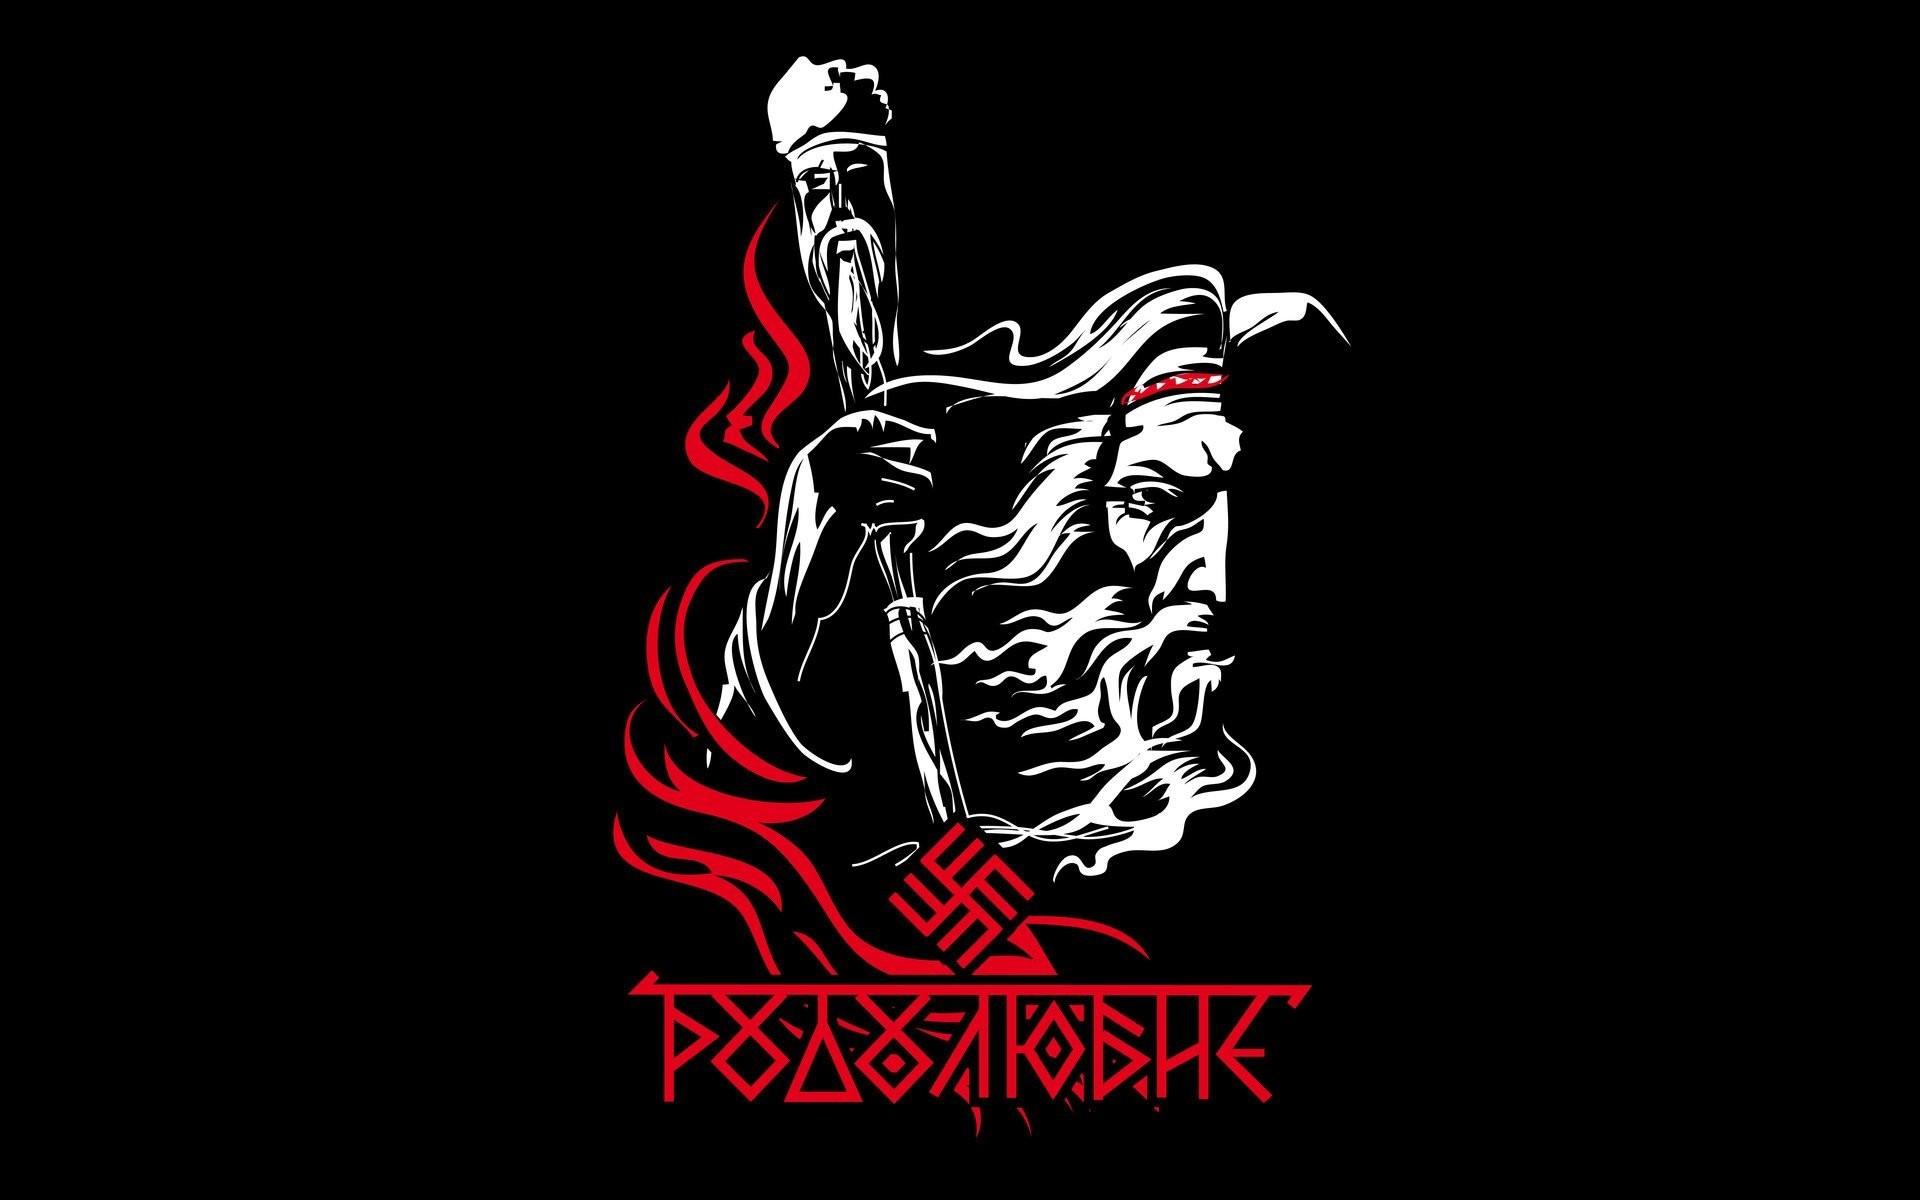 cypma4 pagan vedism genus slavs russia ancestors sorcerer kolovrat swastika